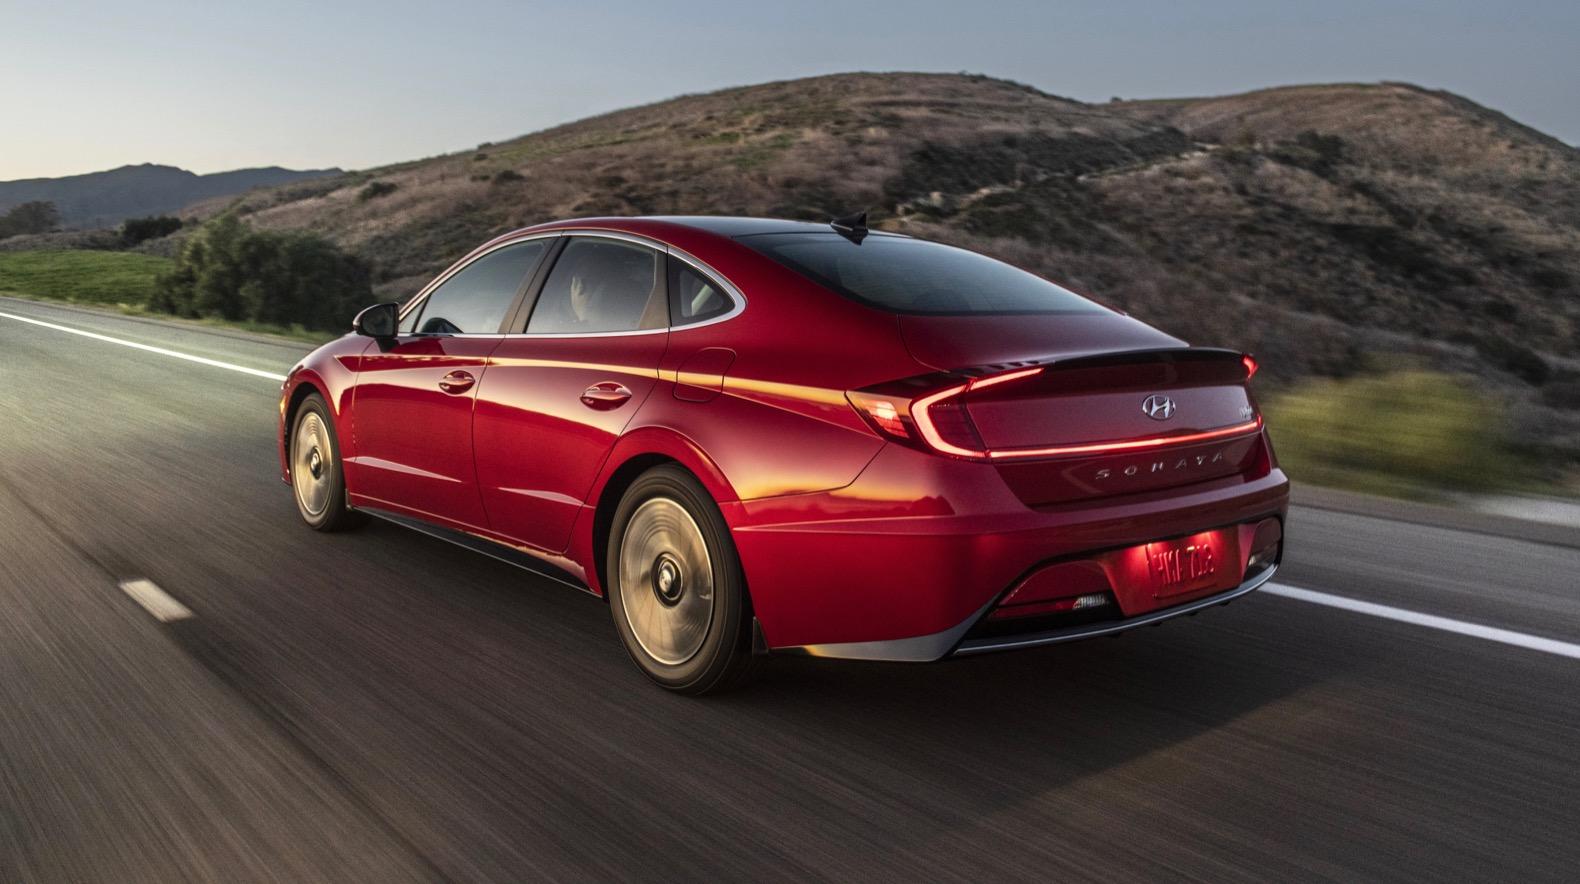 2020 Hyundai Sonata Hybrid arrives with 52 mpg rating ...